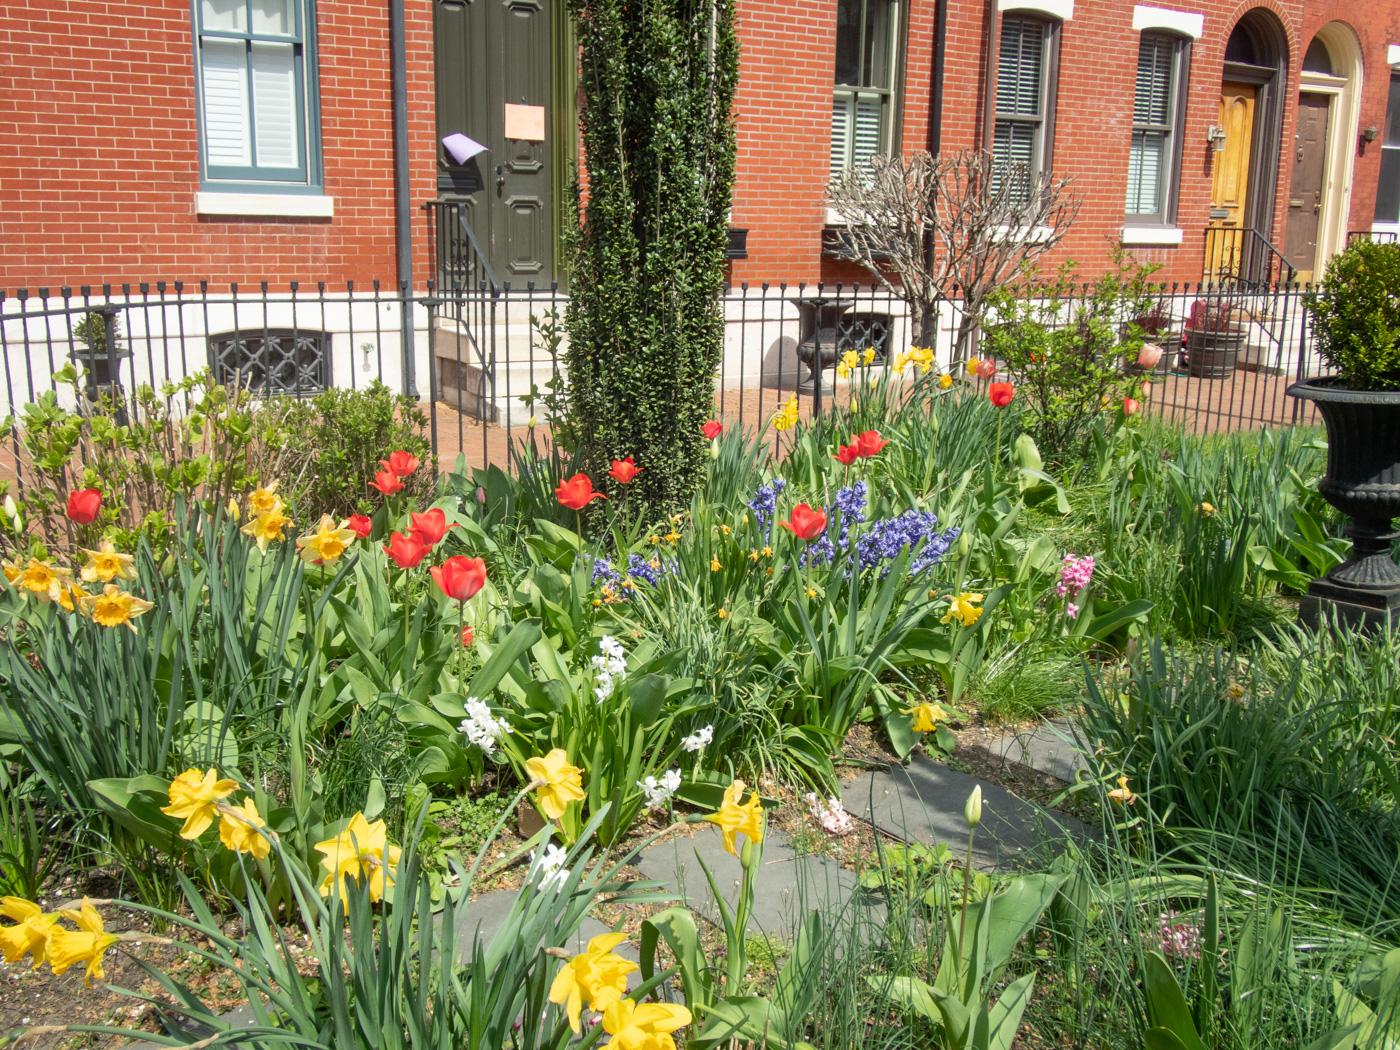 St. Albans Street Garden